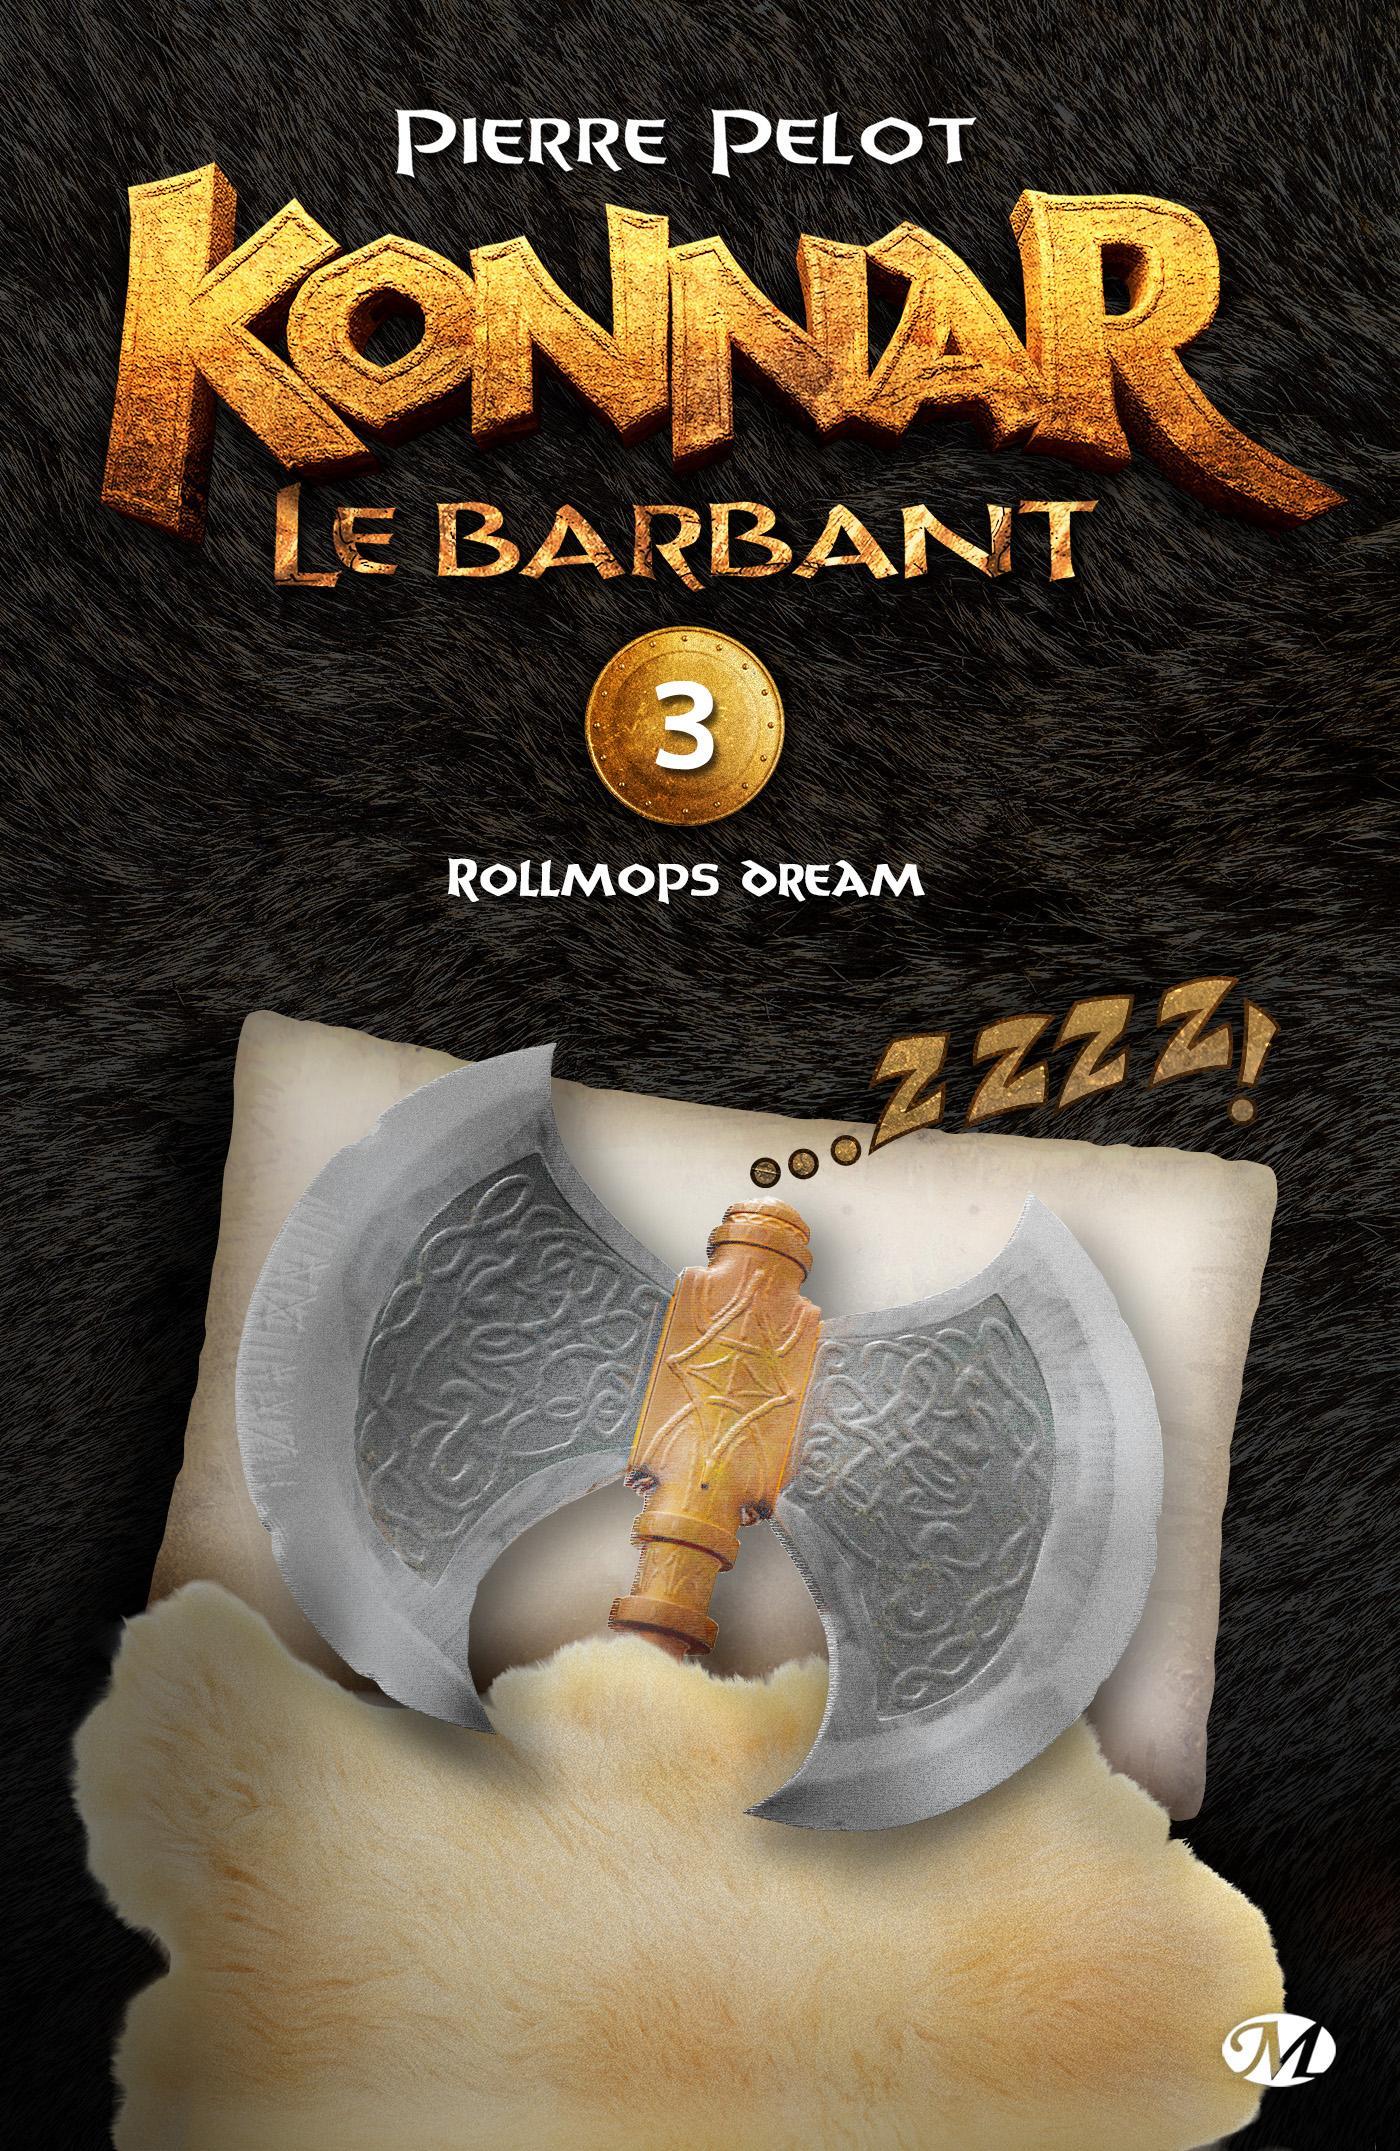 Rollmops Dream, KONNAR LE BARBANT, T3